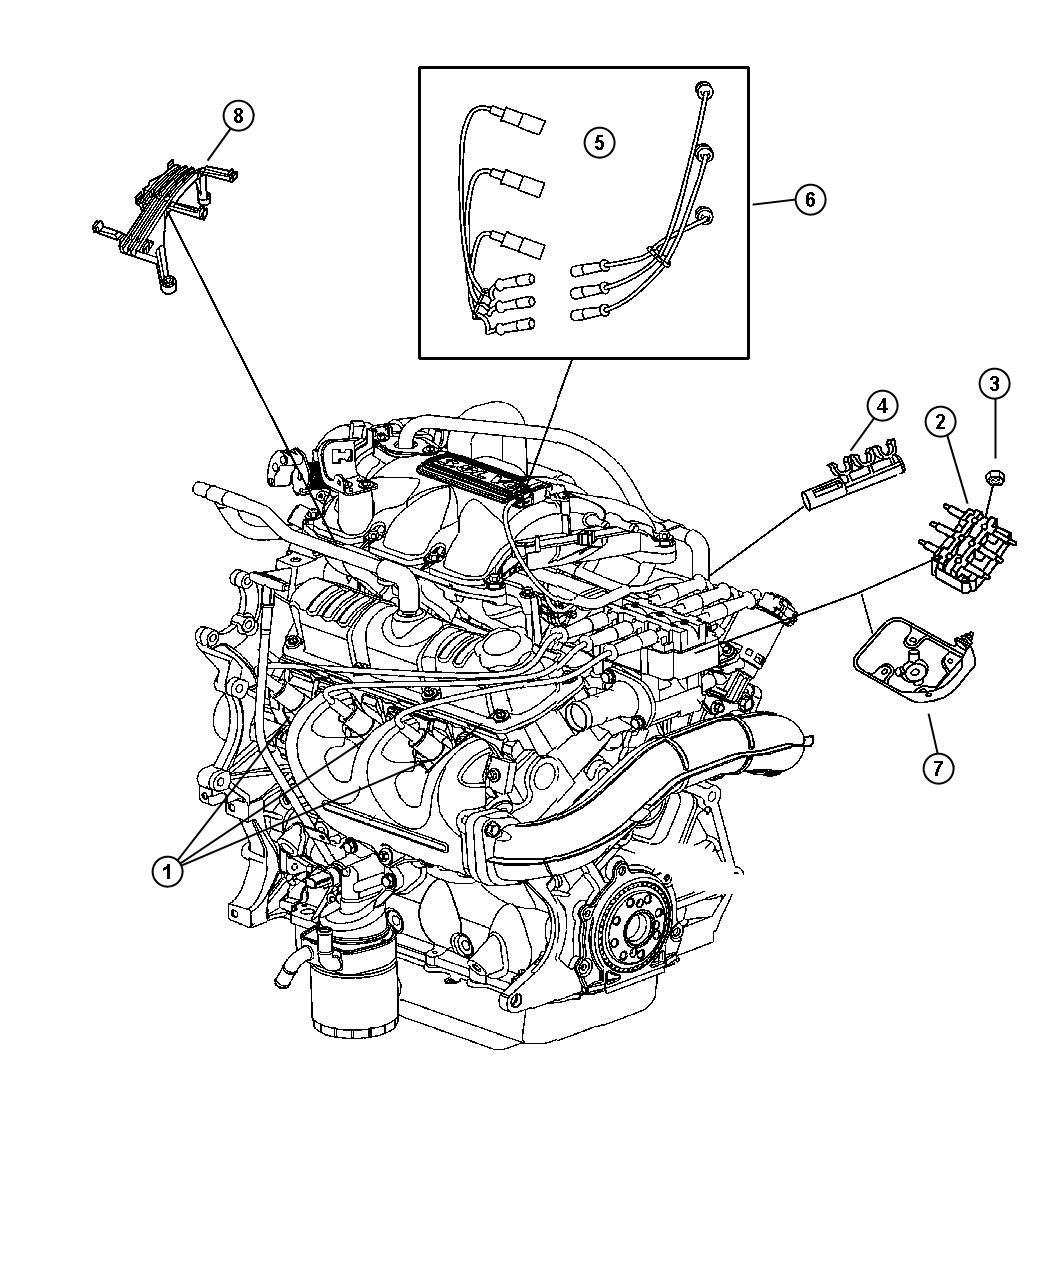 2007 Chrysler Pacifica 3 8 Engine Diagram Wiring Diagram Schema Put Shape A Put Shape A Atmosphereconcept It